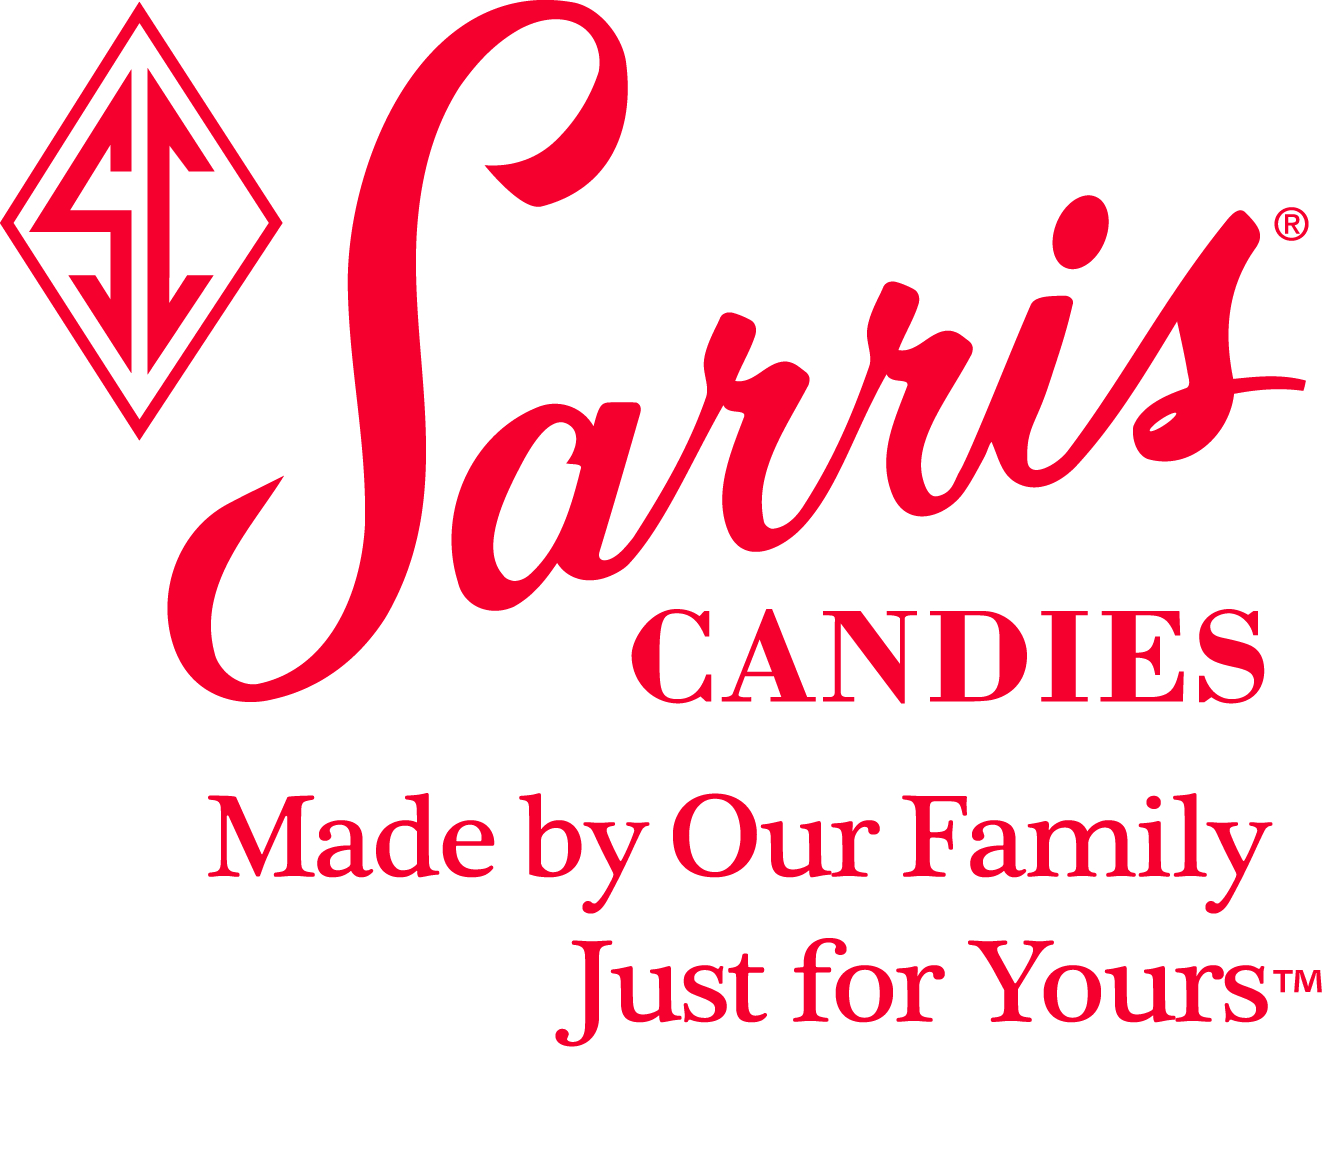 Sarris Candy Co